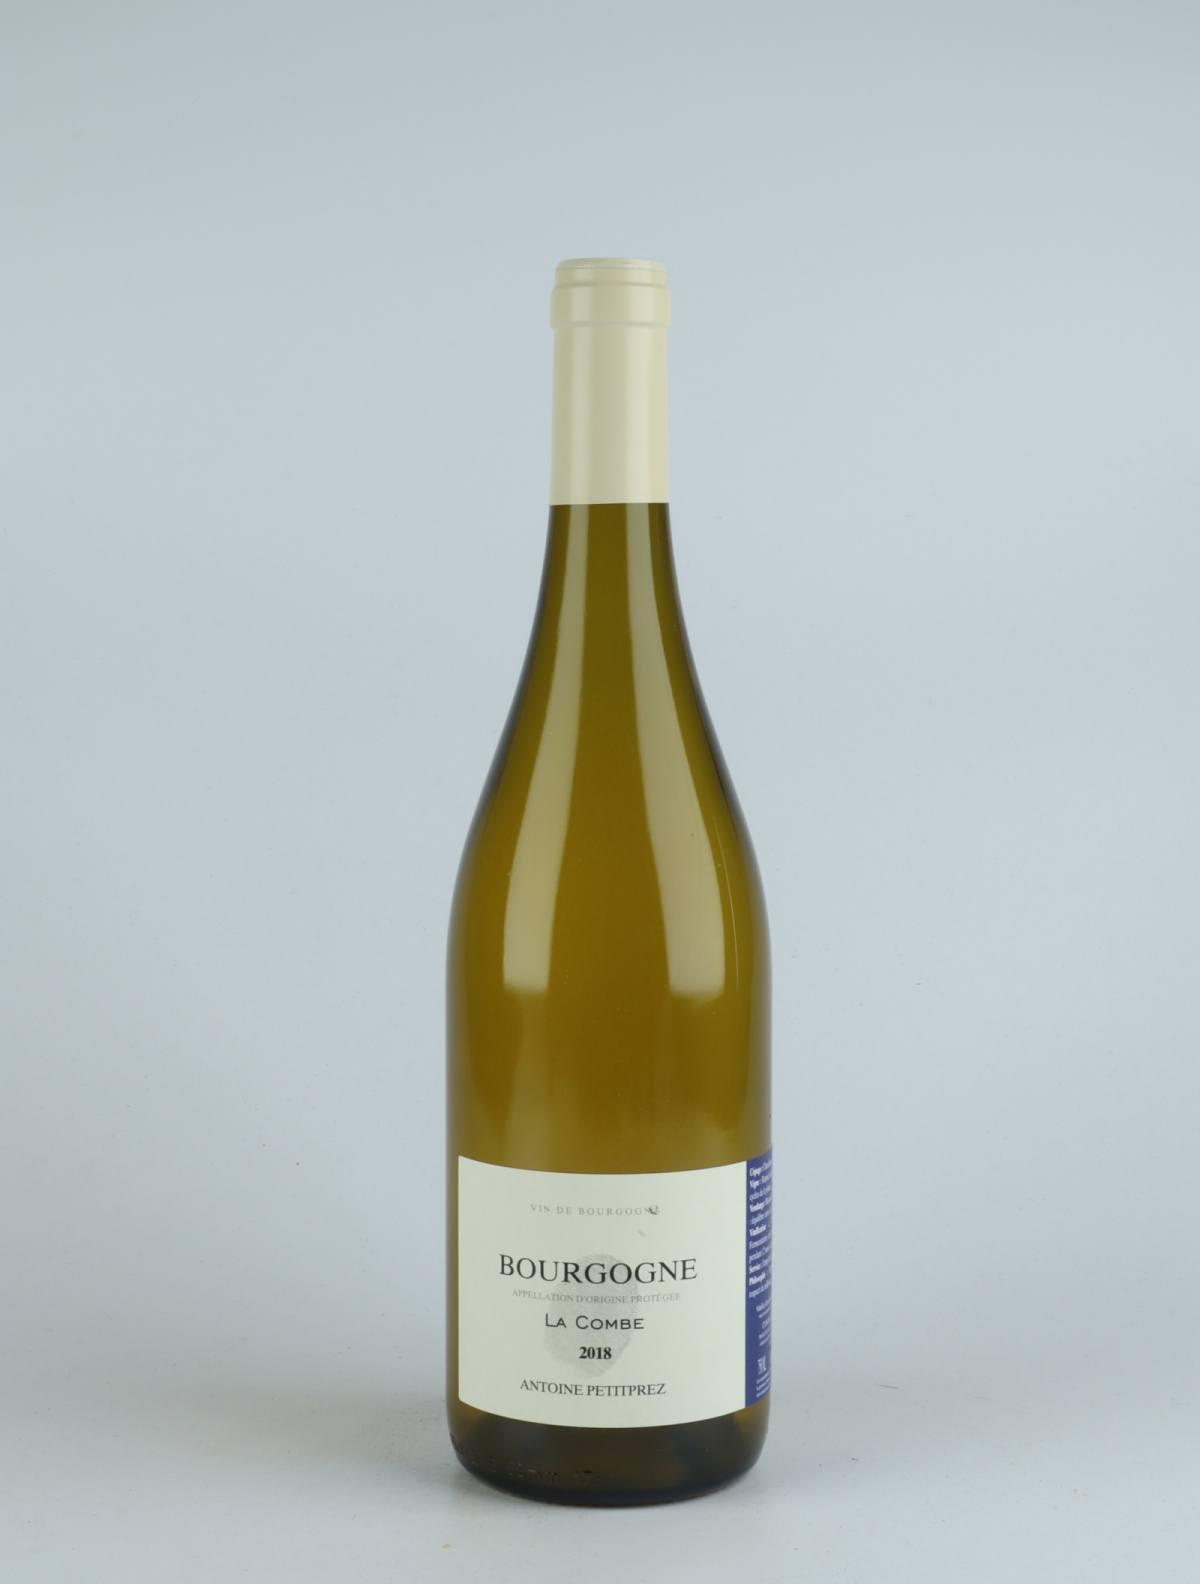 Bourgogne Blanc - La Combe